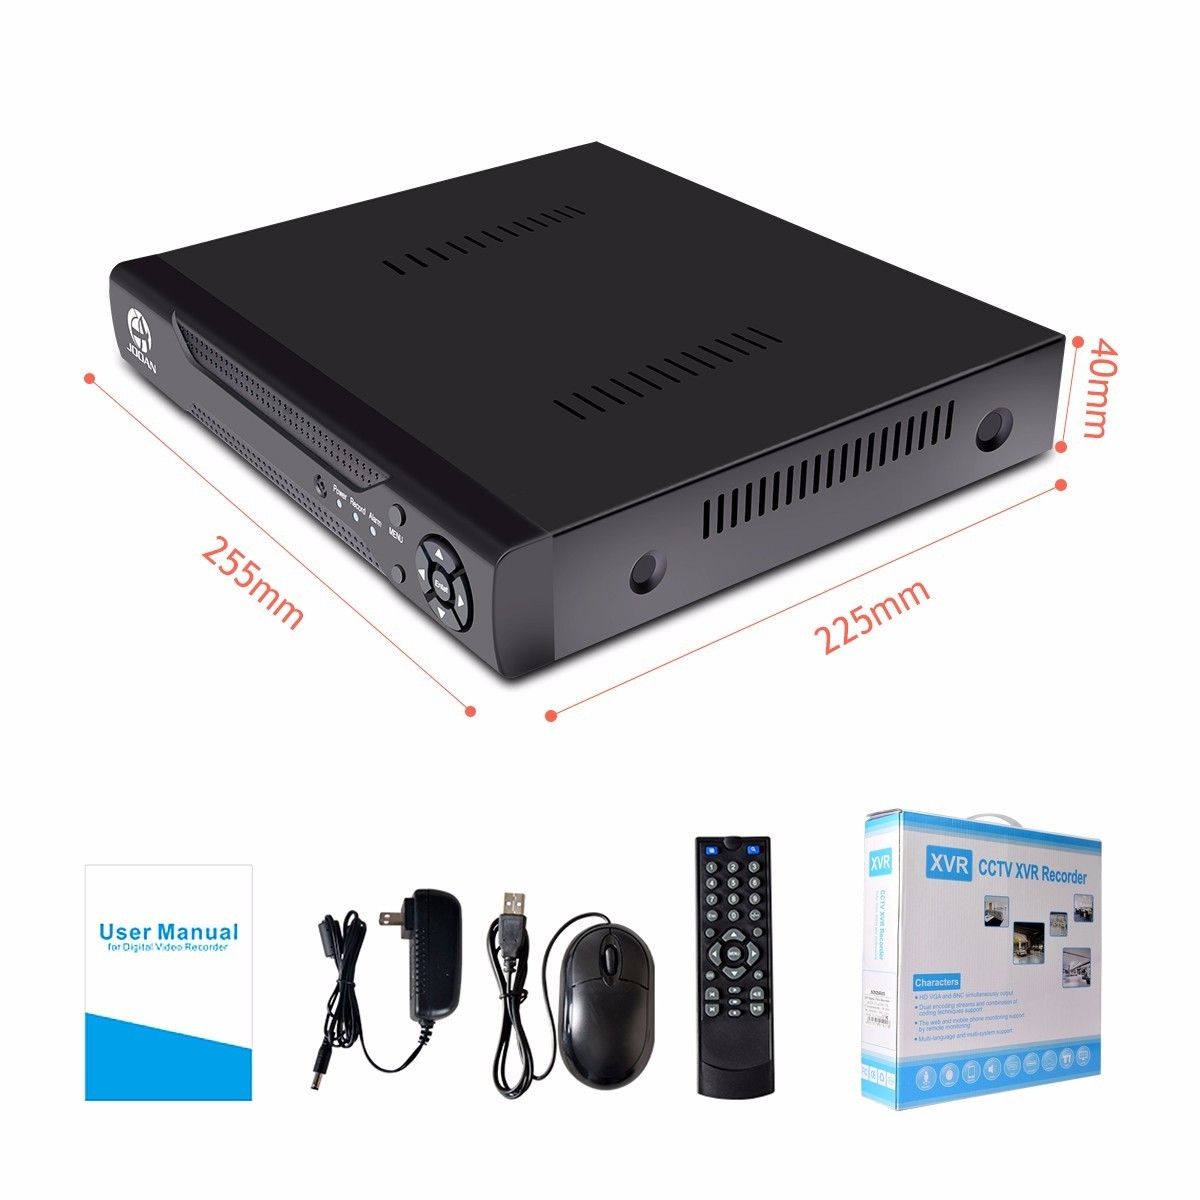 JOOAN 4CH 8CH 16CH CCTV DVR Güvenlik Sistemi 1080N H.264 - Güvenlik ve Koruma - Fotoğraf 6